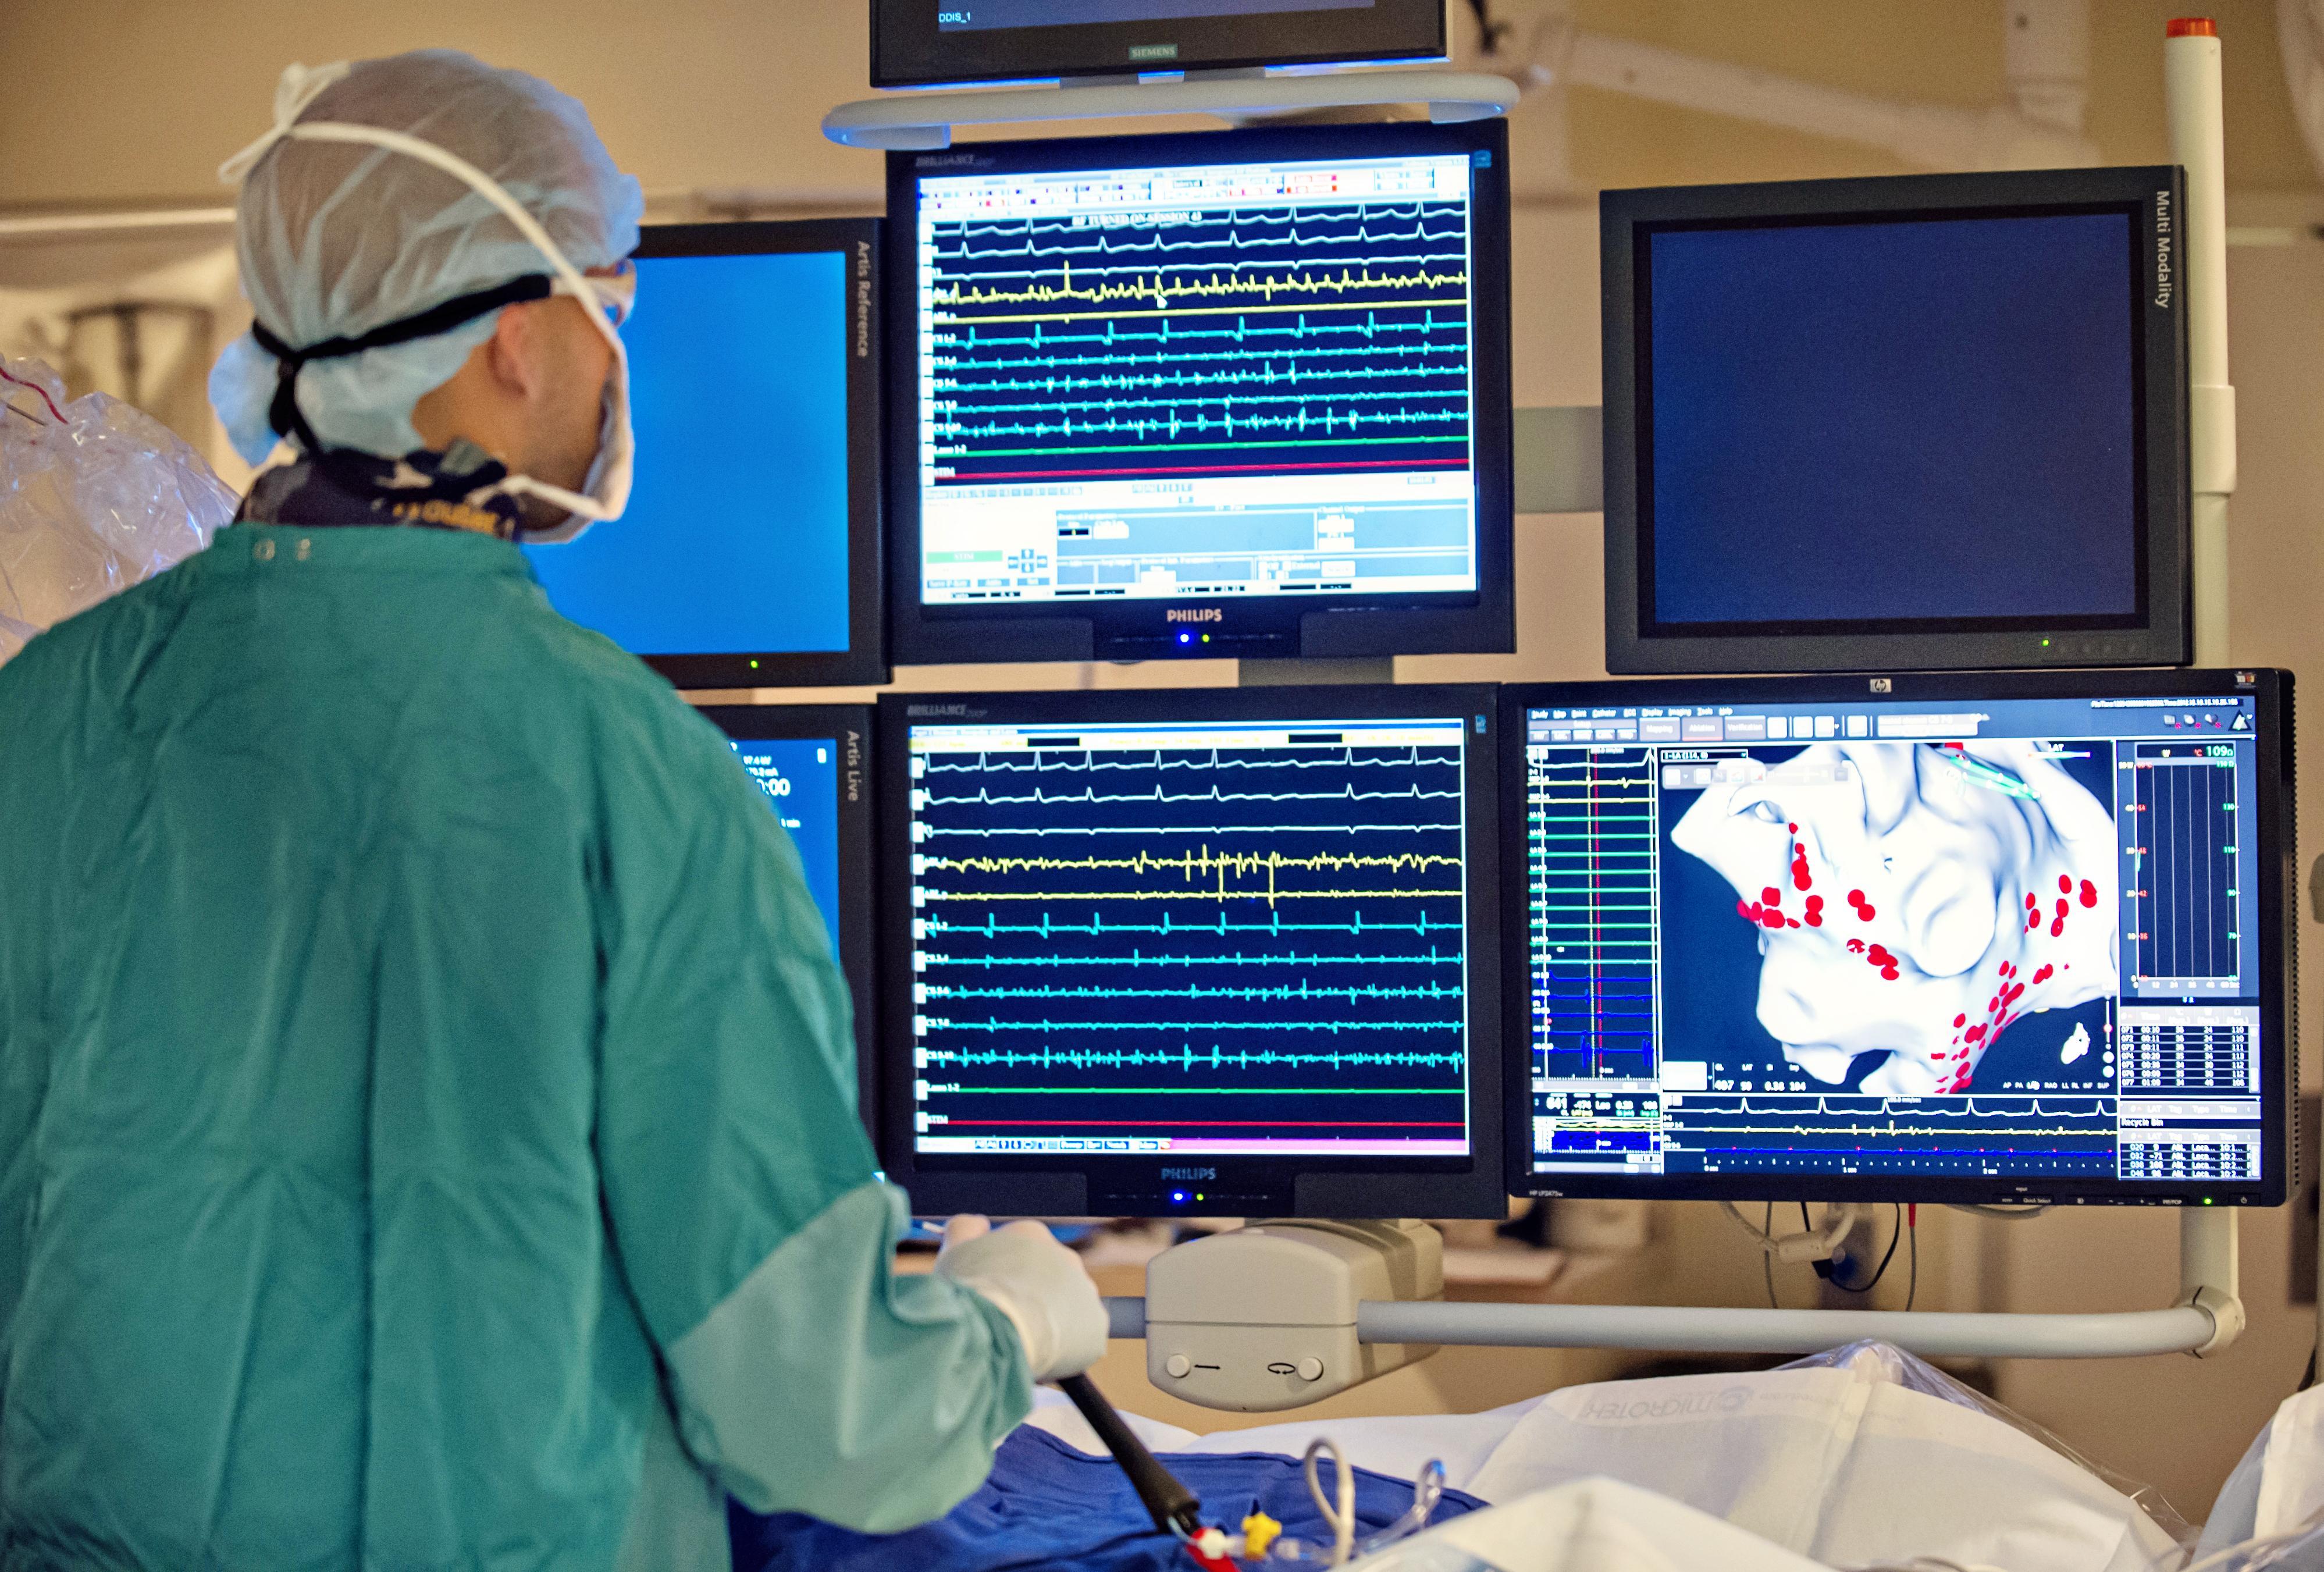 Electrophysiology lab